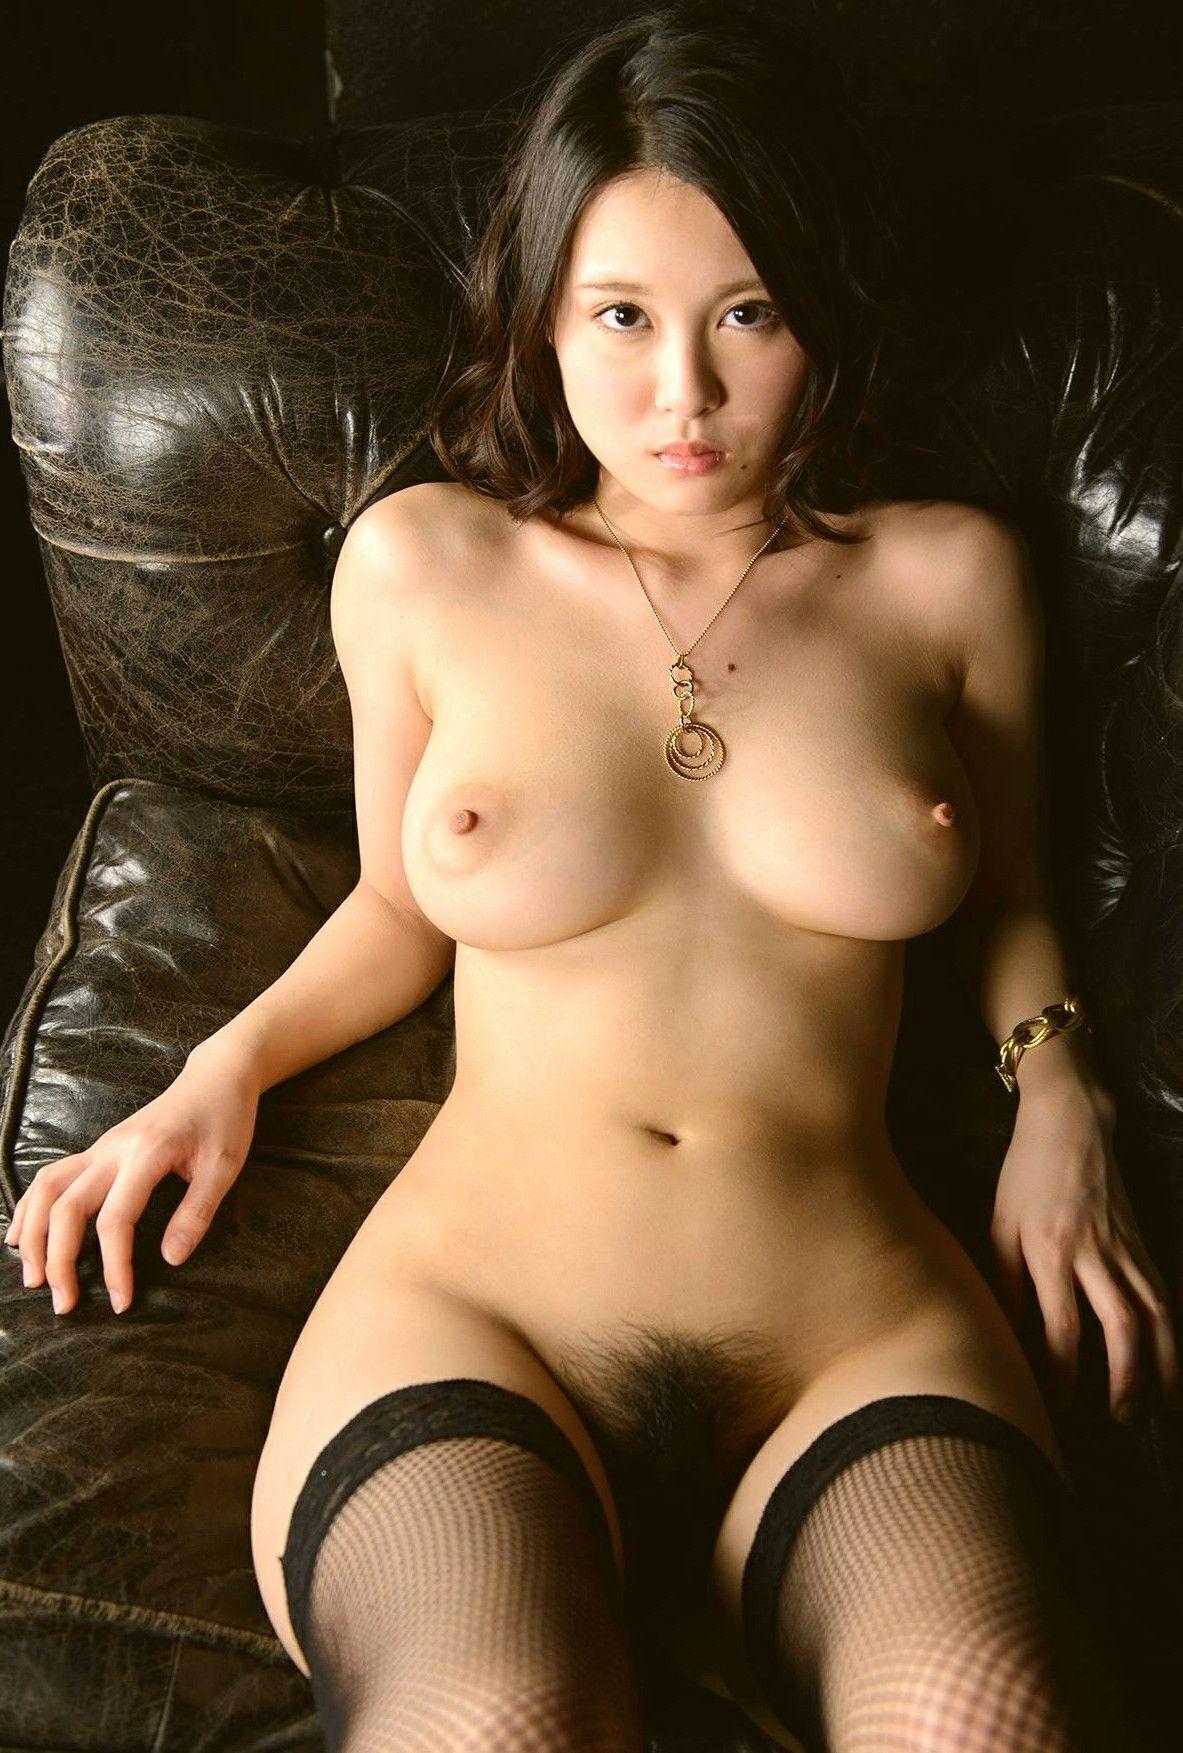 perfect nipples